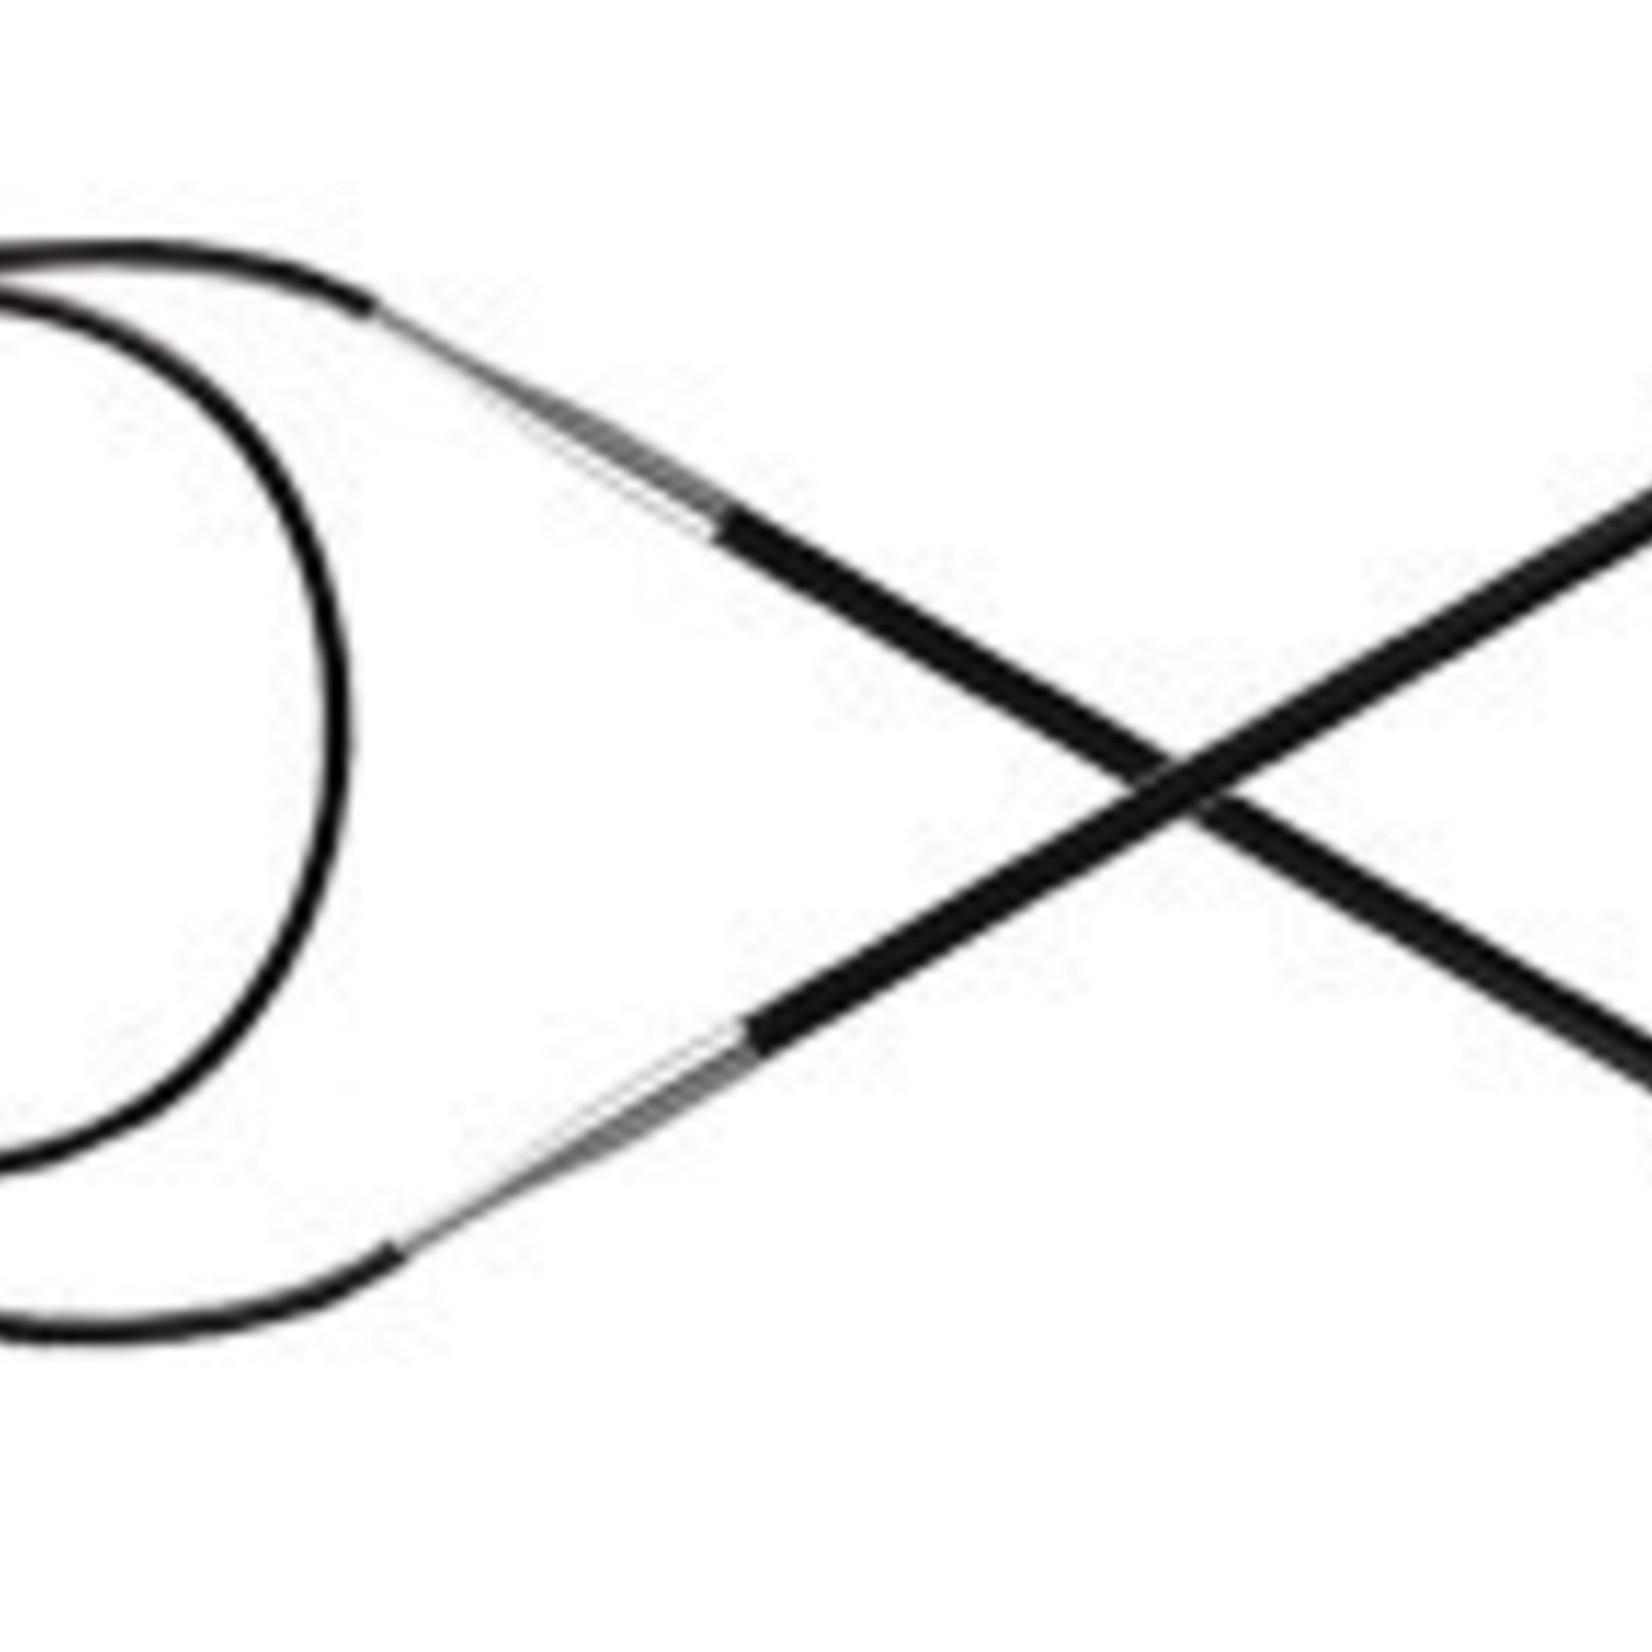 Knitter's Pride 1 Karbonz Circular 16